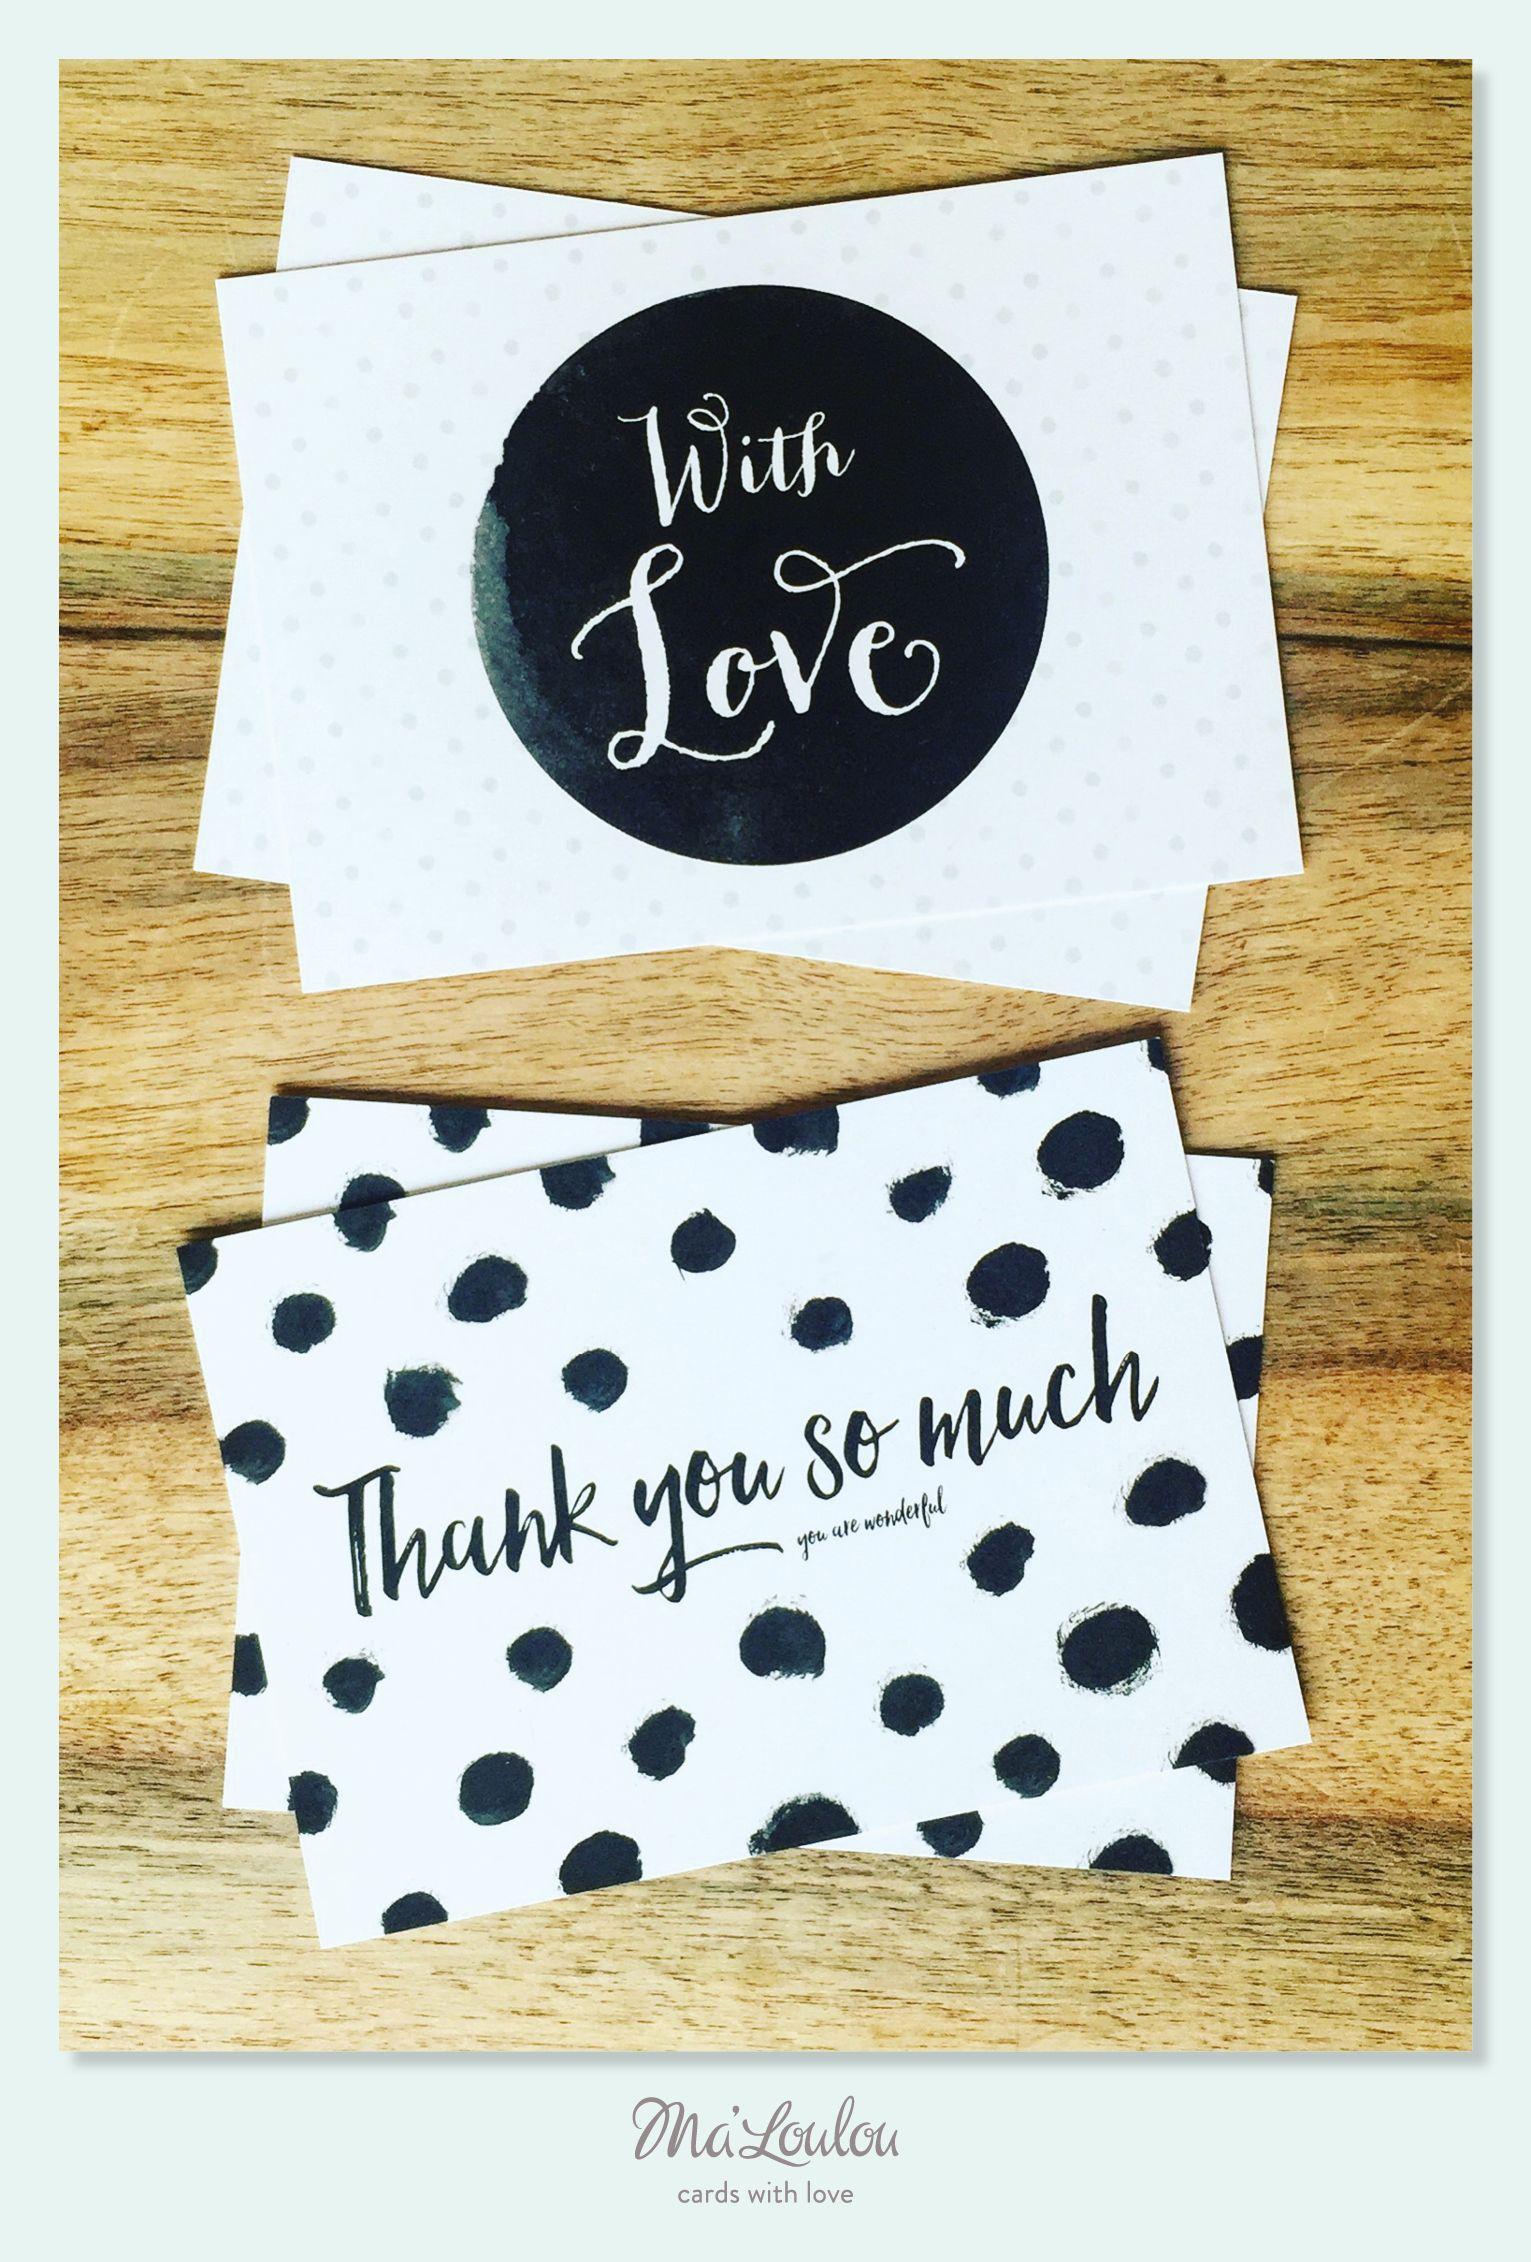 Einfach Danke sagen! #postkarte #with love #danke #merci #